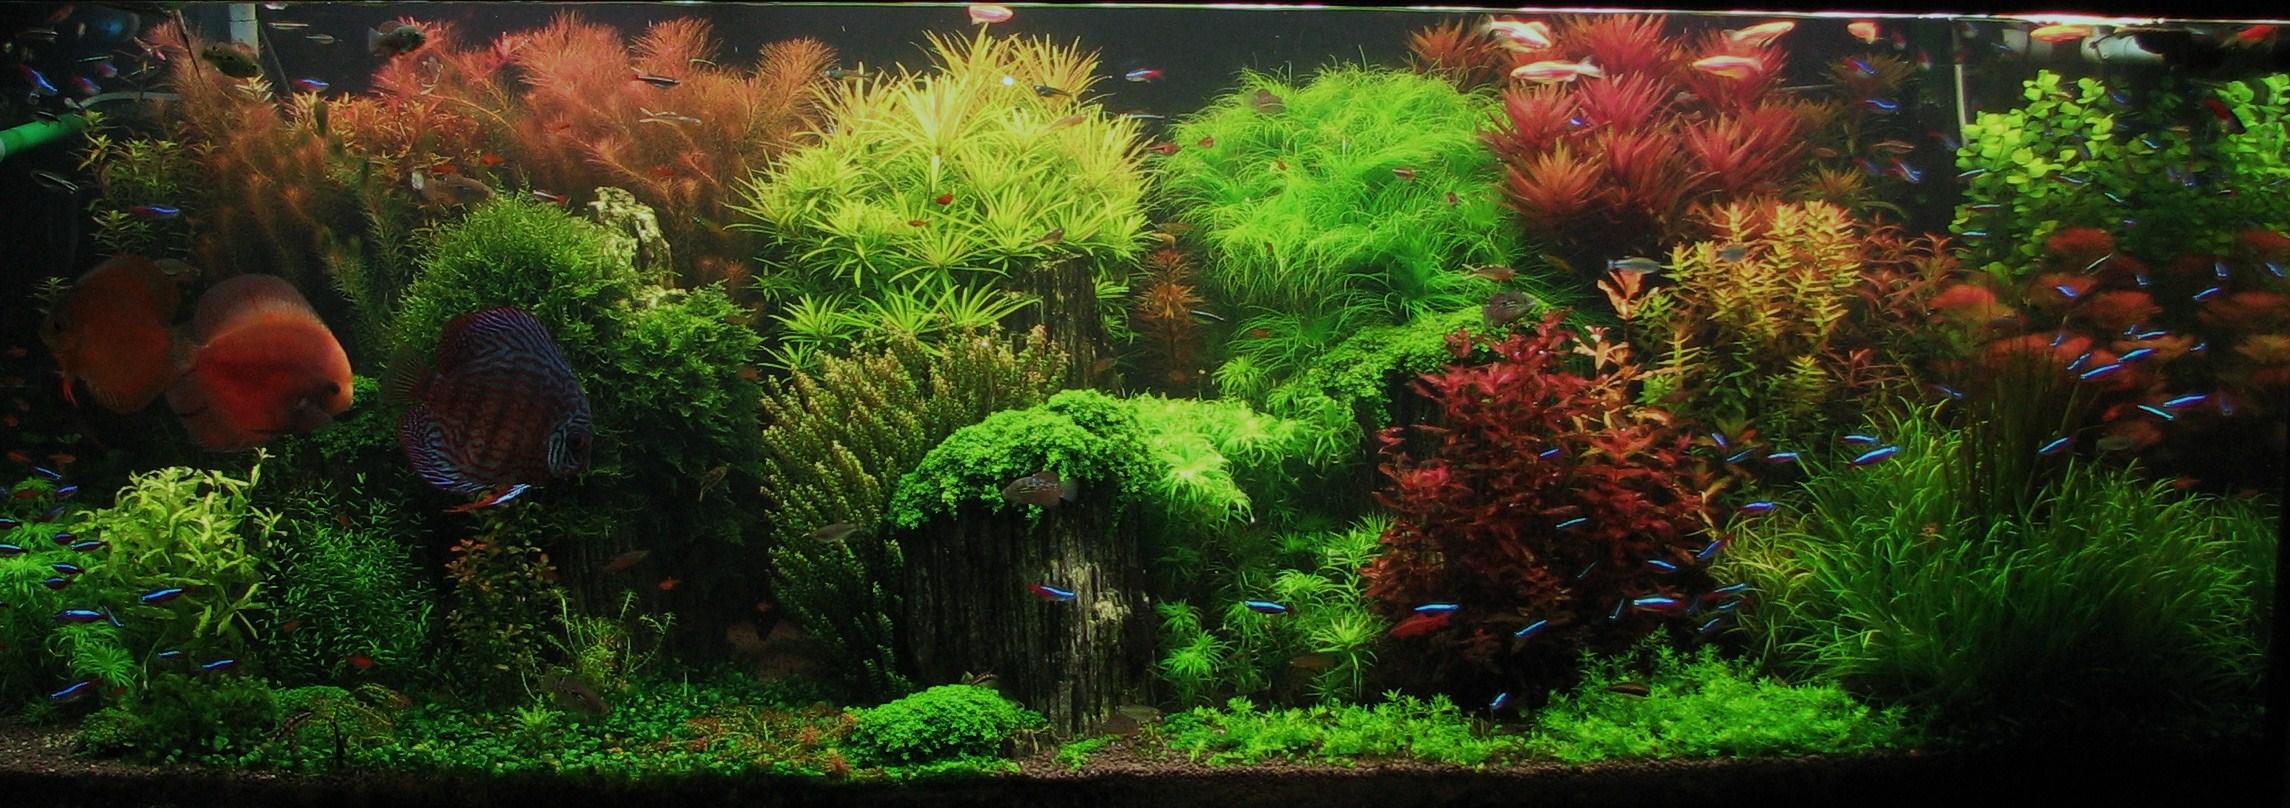 File The Enchanted Garden By Shay Fertig Jpg Wikimedia Commons